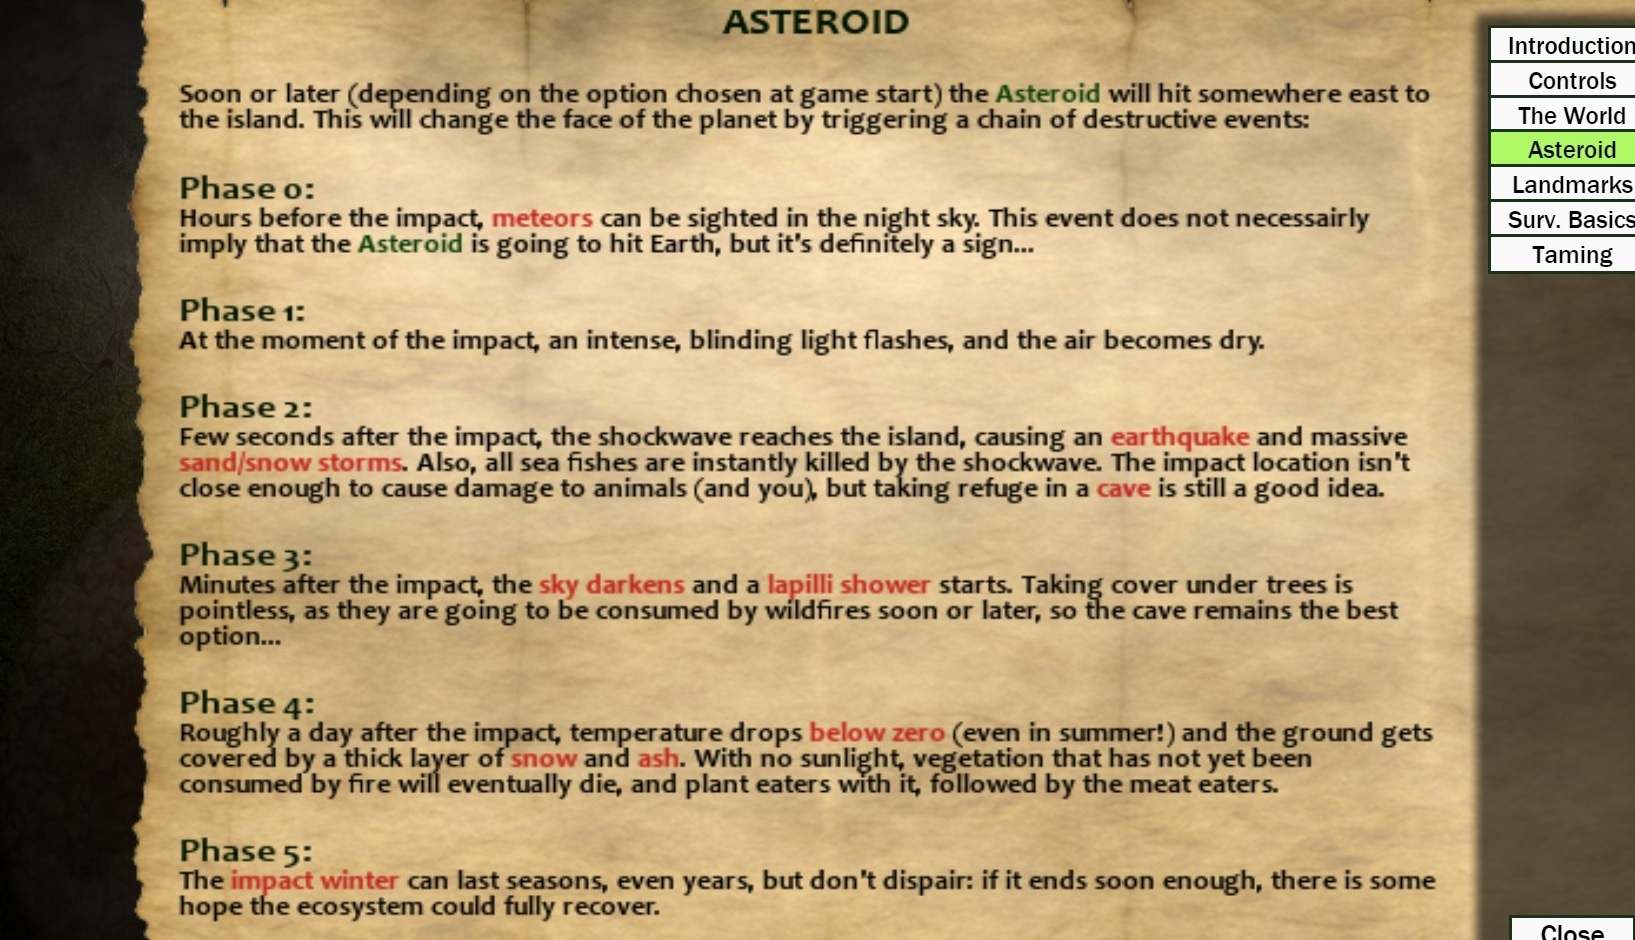 DinoSystem :: Update v0 80 0 - Asteroid, fish population